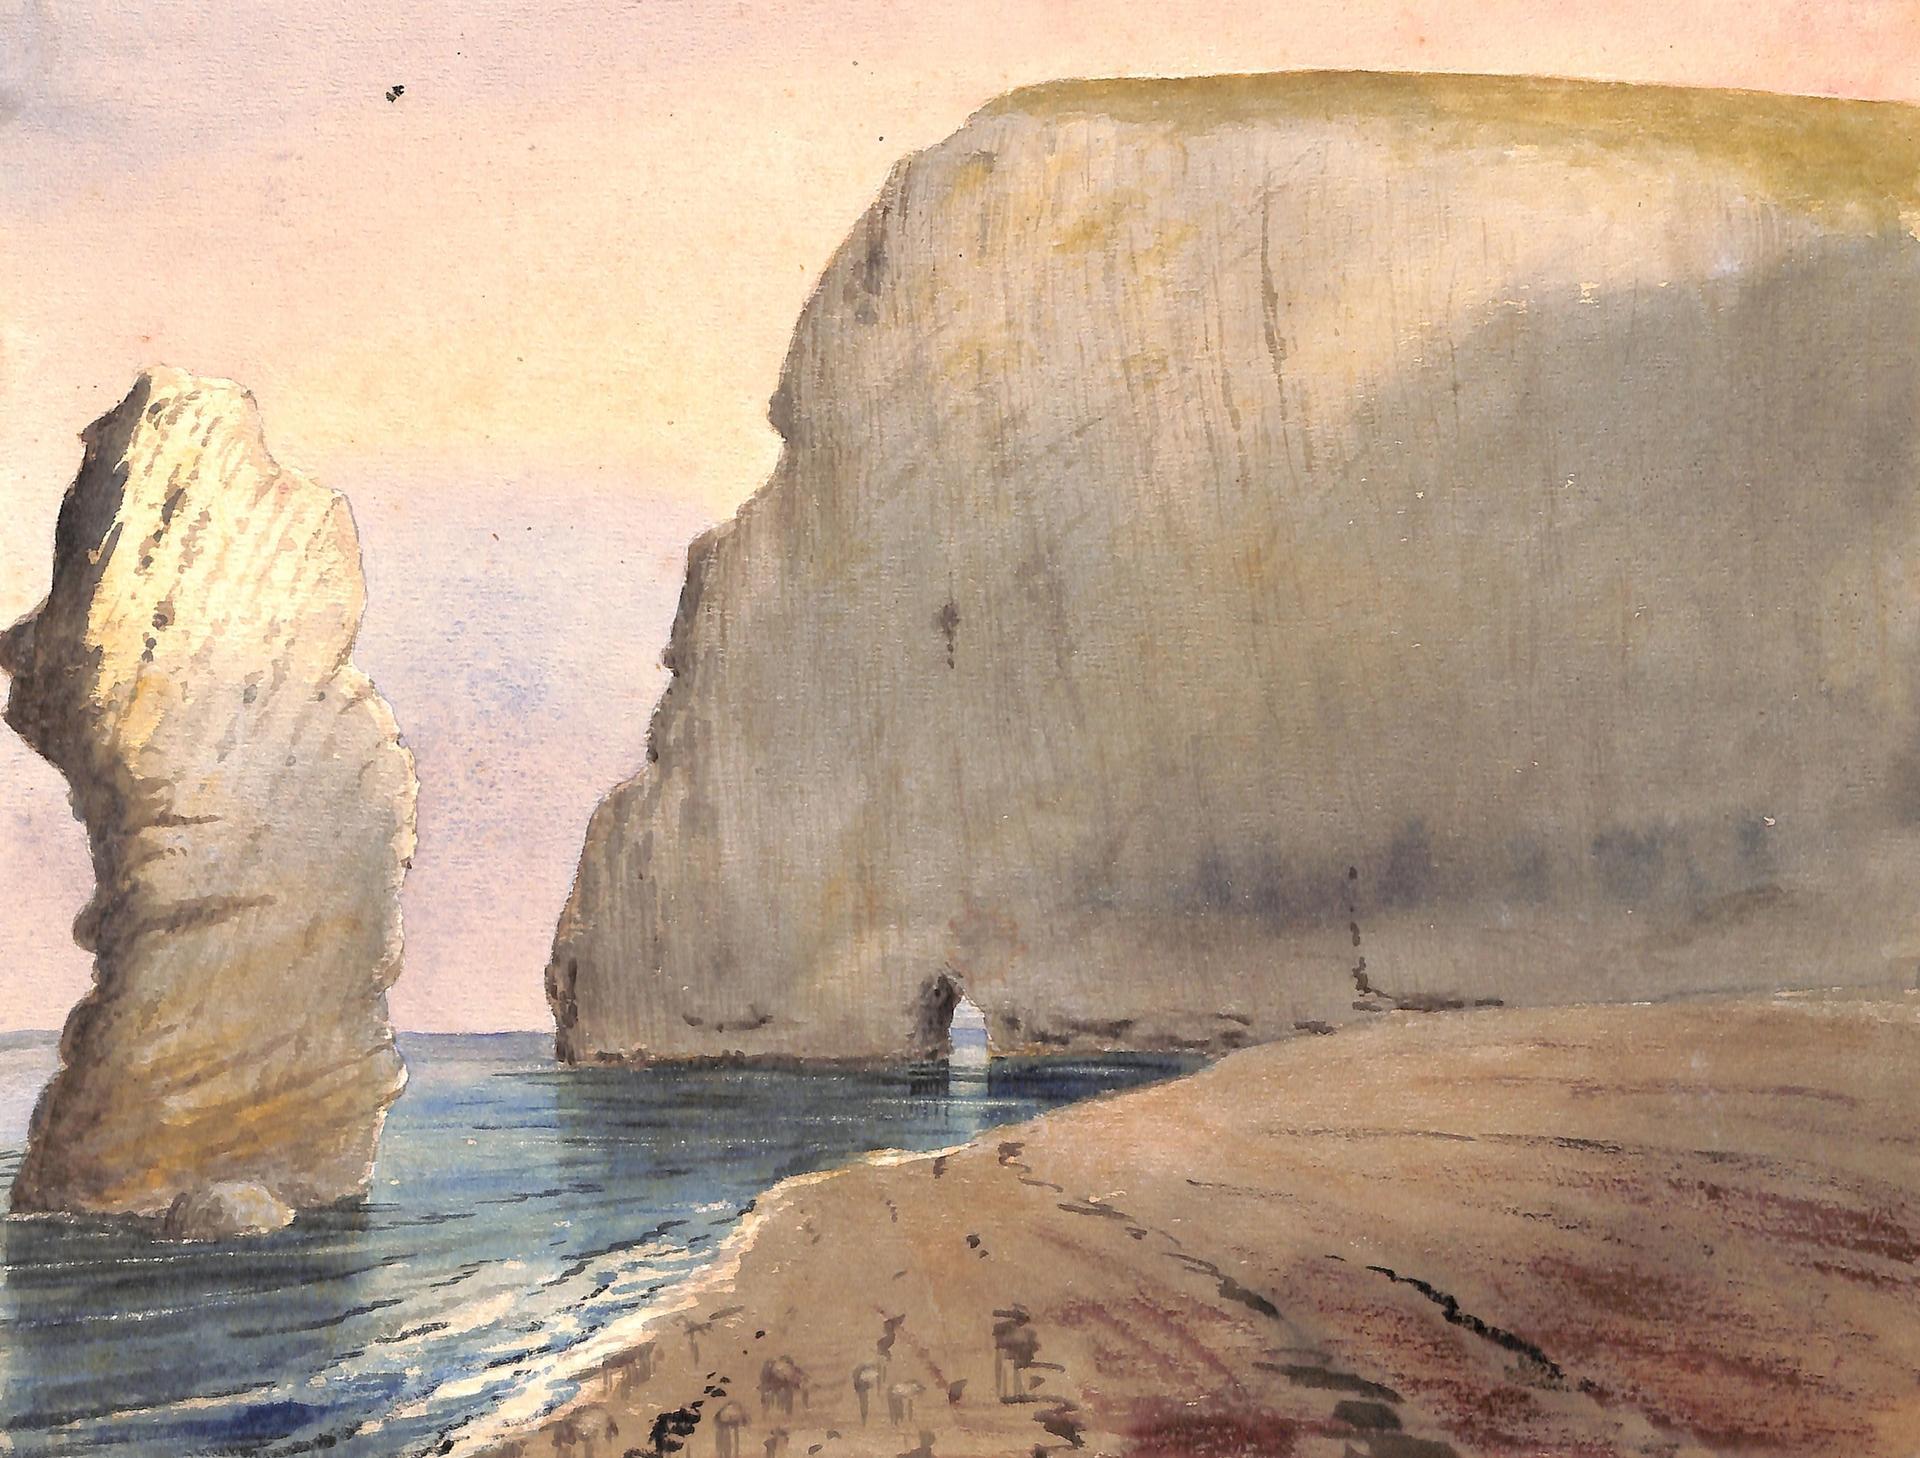 Bat's Hole (undated) by Henry Joseph Moule © Dorset County Museum